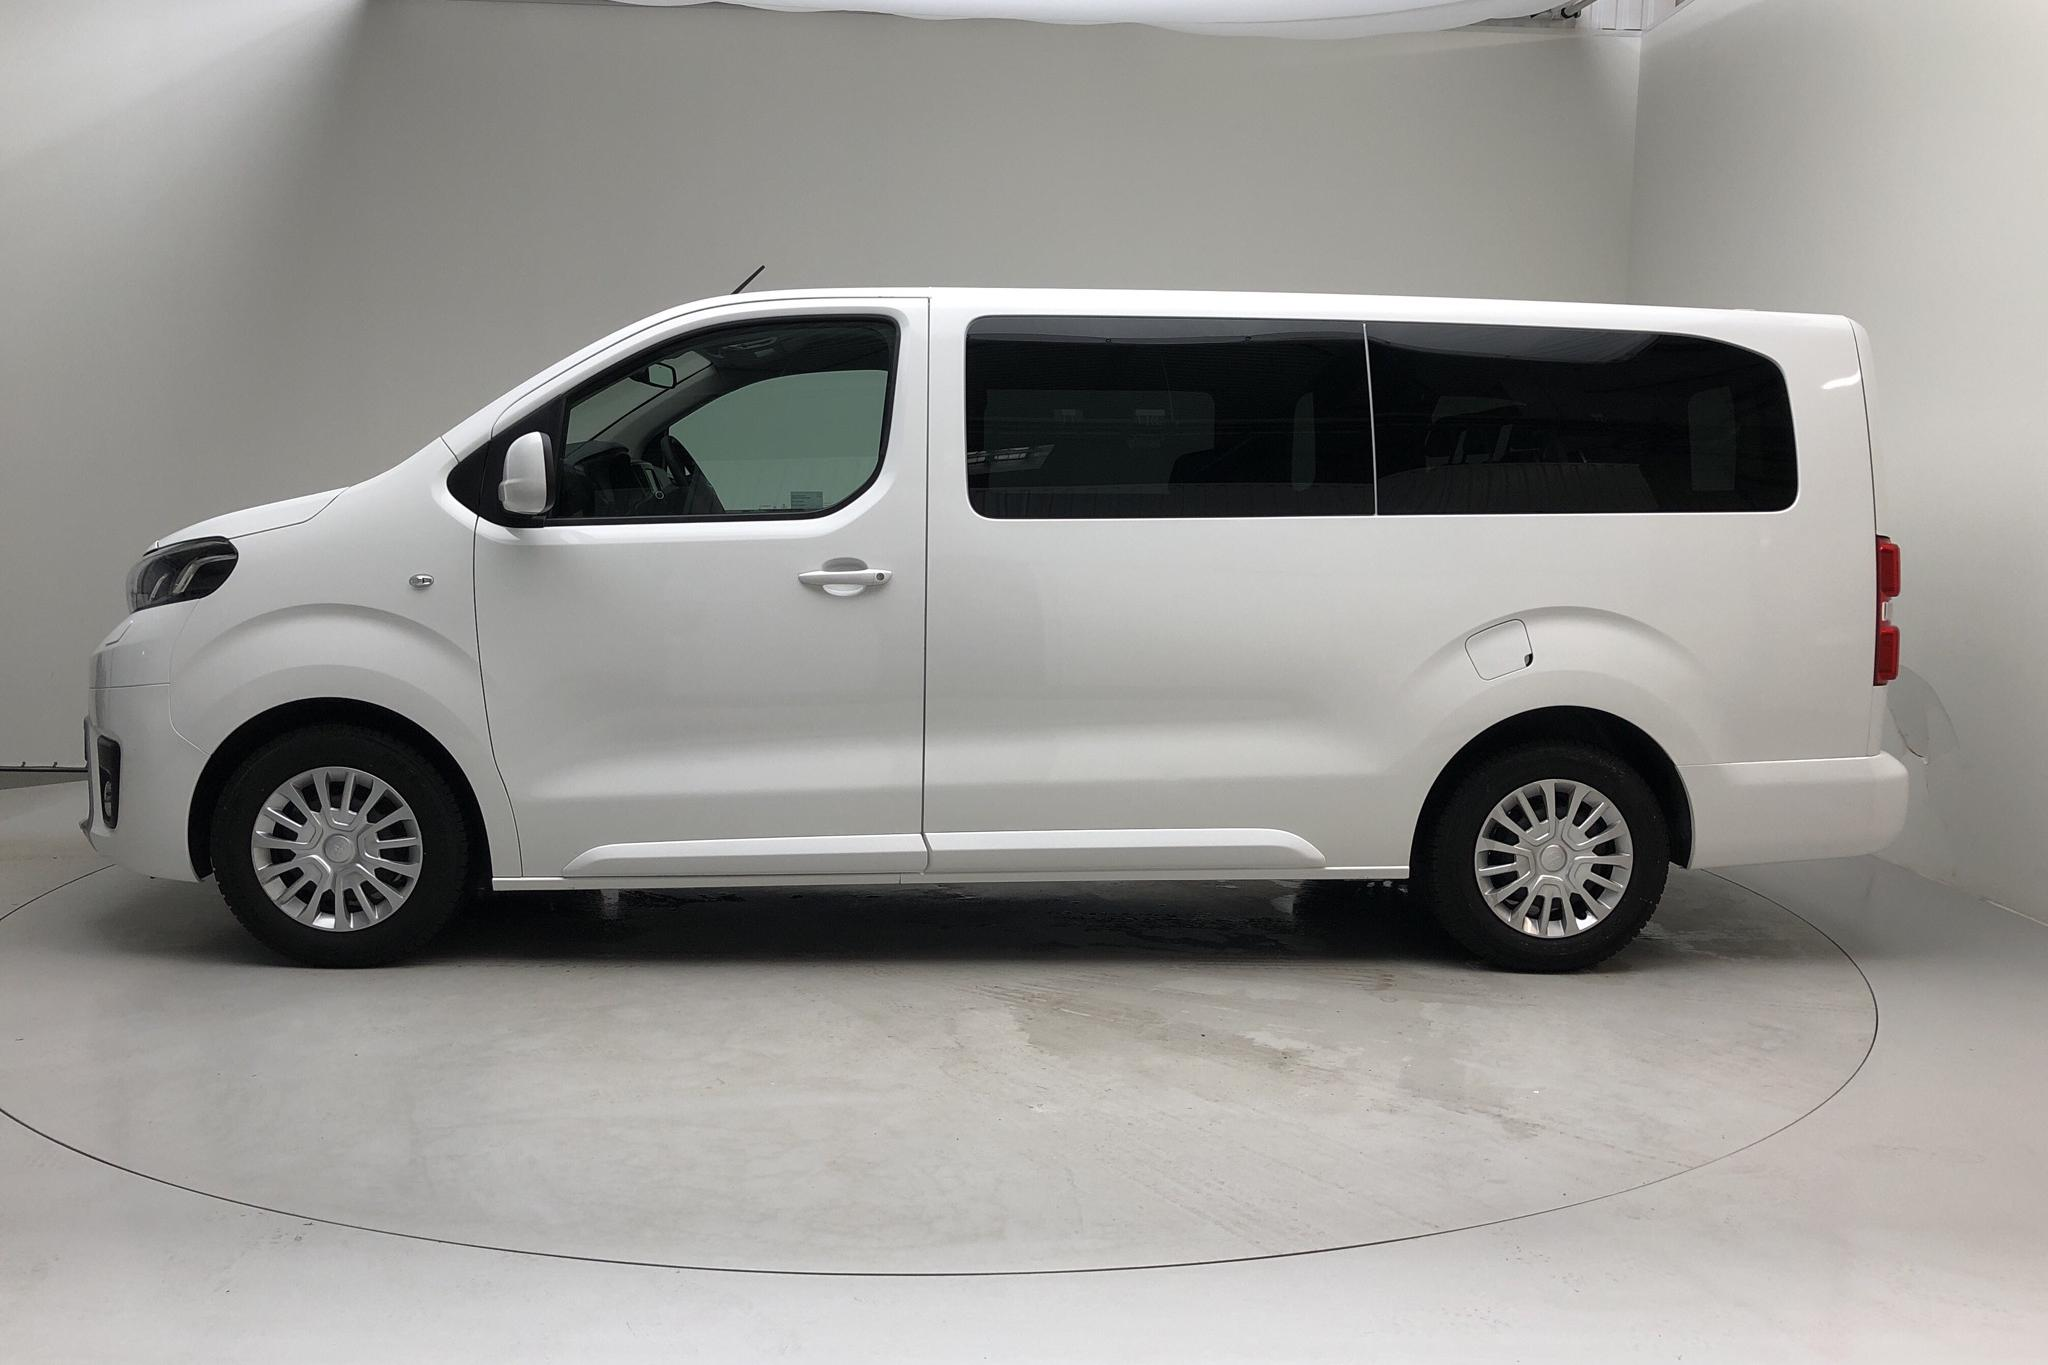 Toyota PROACE Verso 1.5D (120hk) - 4 982 mil - Manuell - vit - 2019